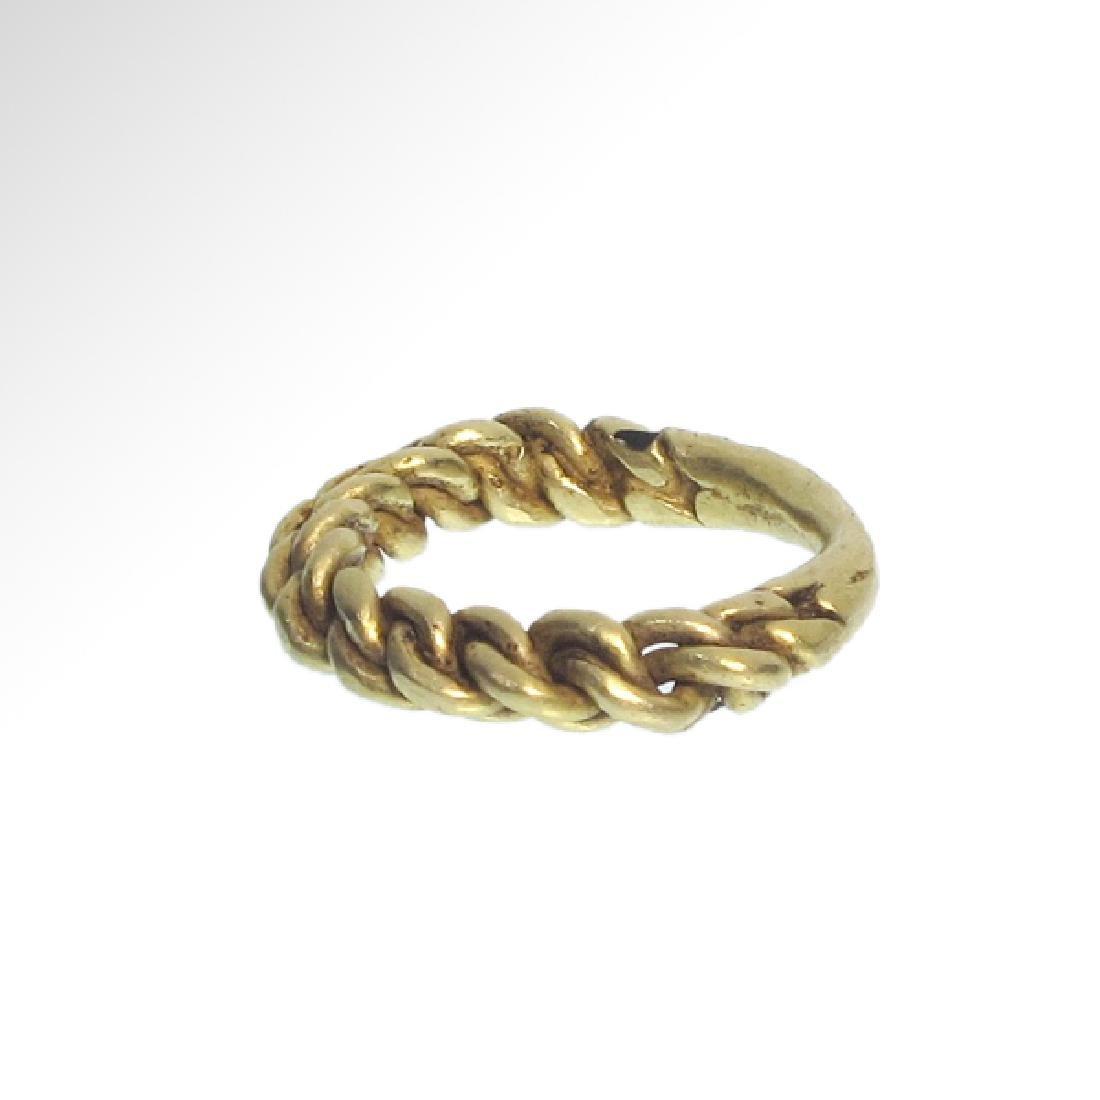 Viking Gold Ring, c. 10th Century A.D. - 5